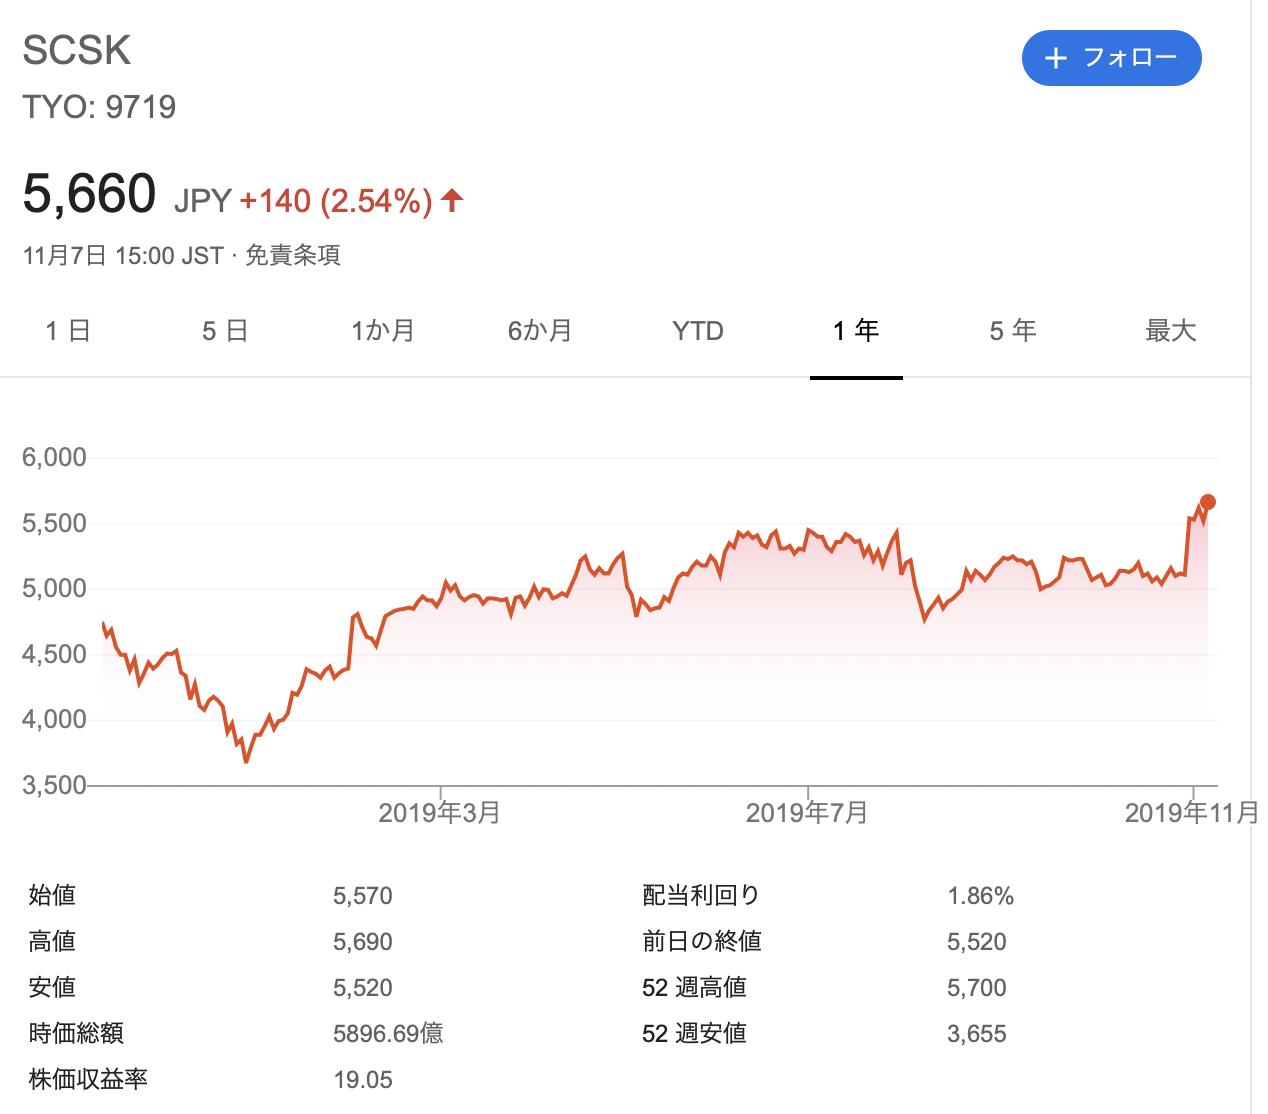 SCSK 株価